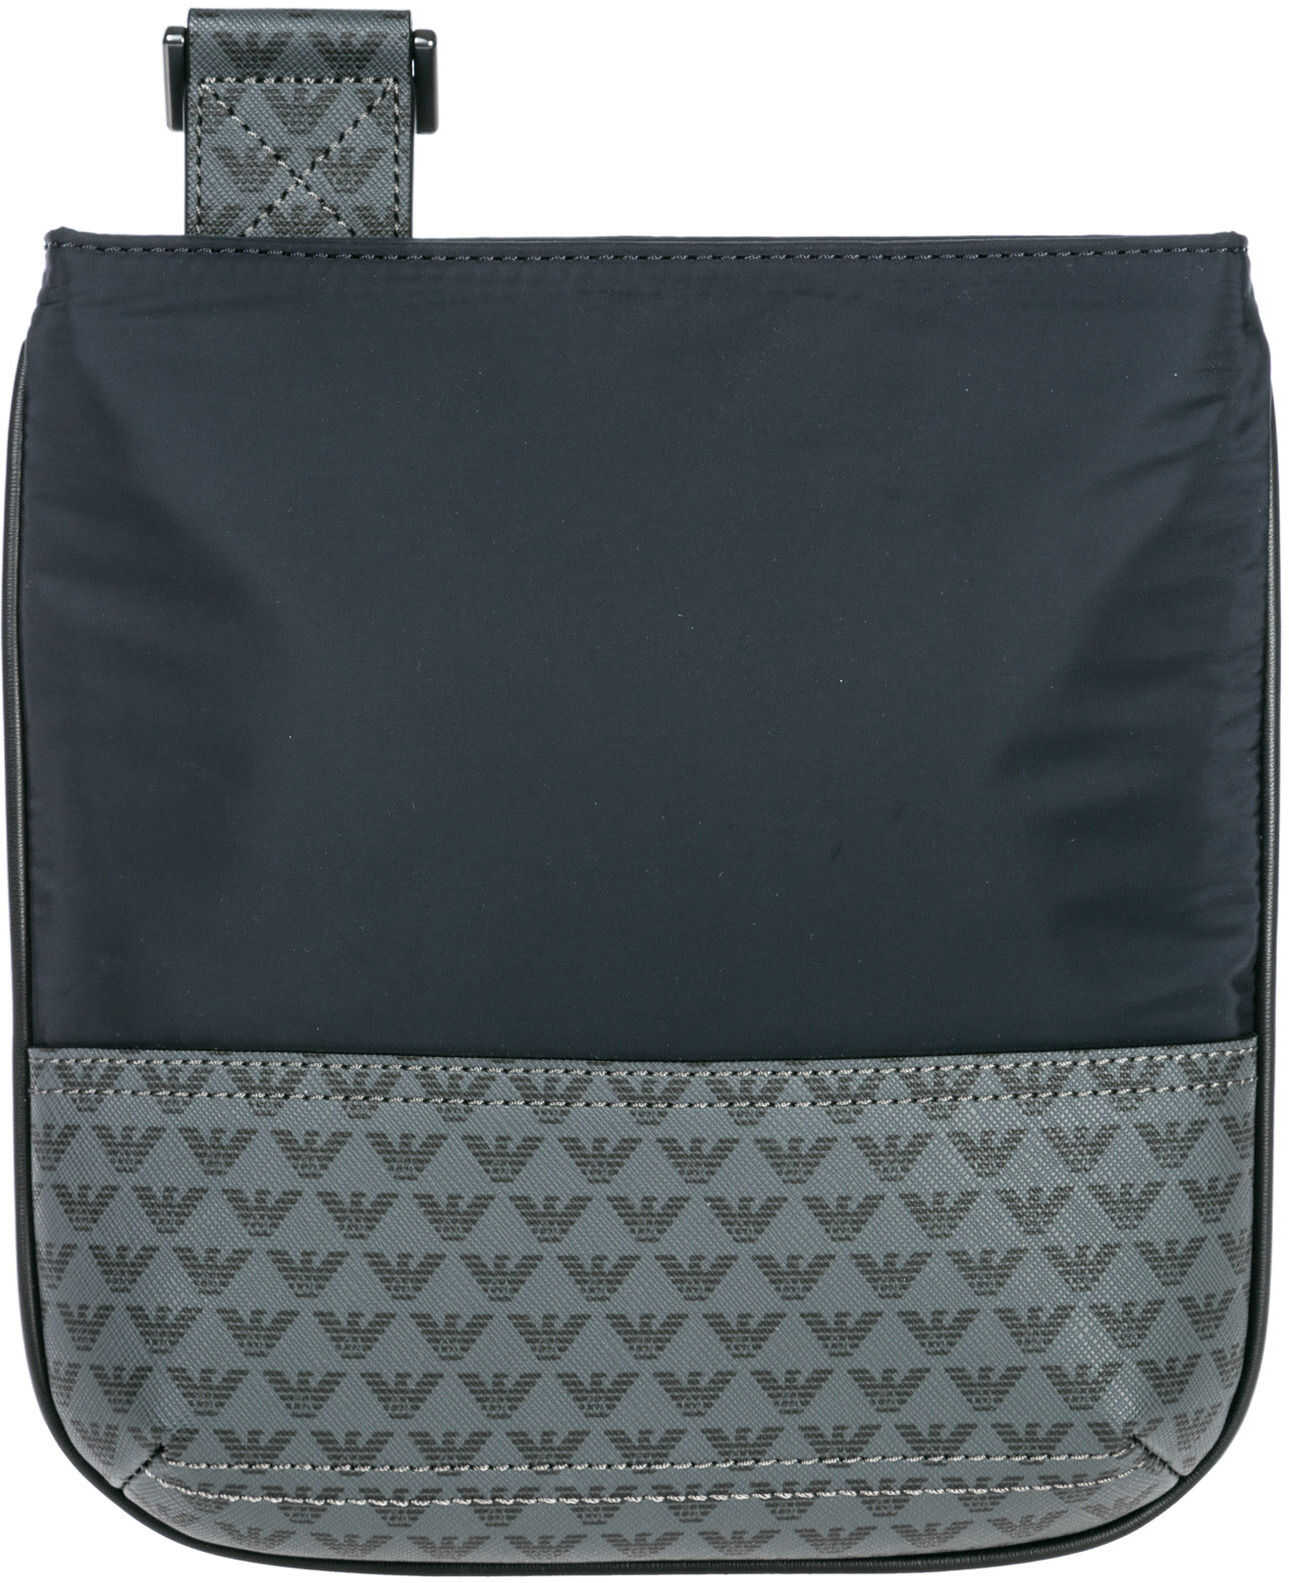 Emporio Armani Shoulder Bag Y4M185YME4J83194 Black imagine b-mall.ro